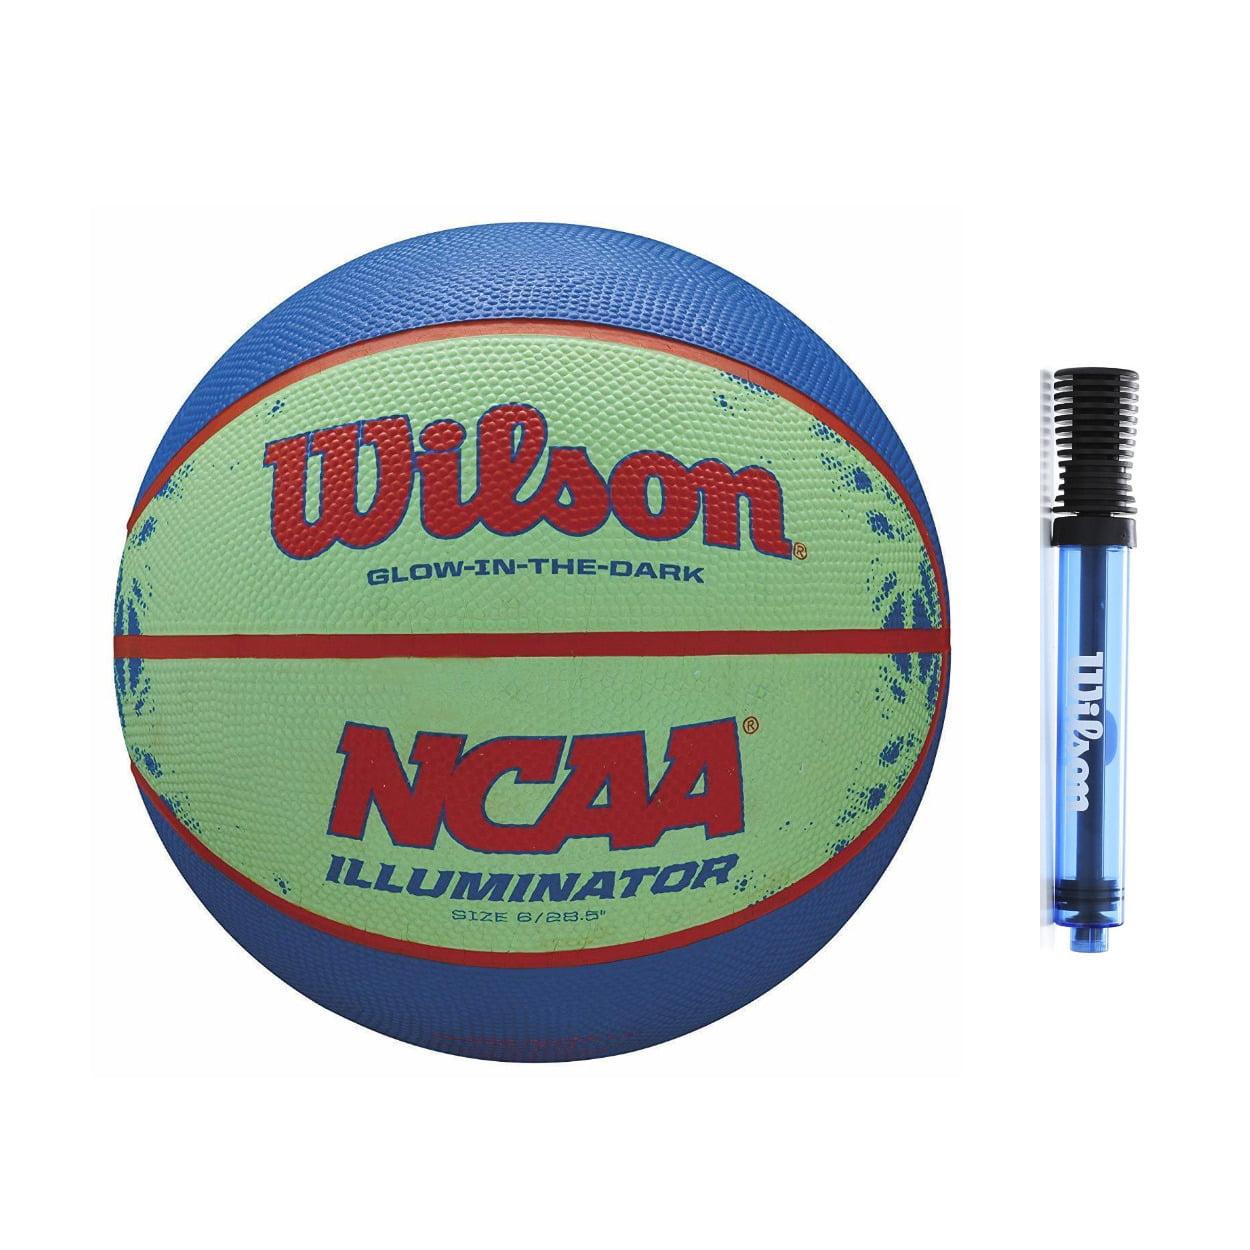 "Wilson NCAA Illuminator Glow-in-The-Dark Basketball (28.5"") and Inflation Pump"